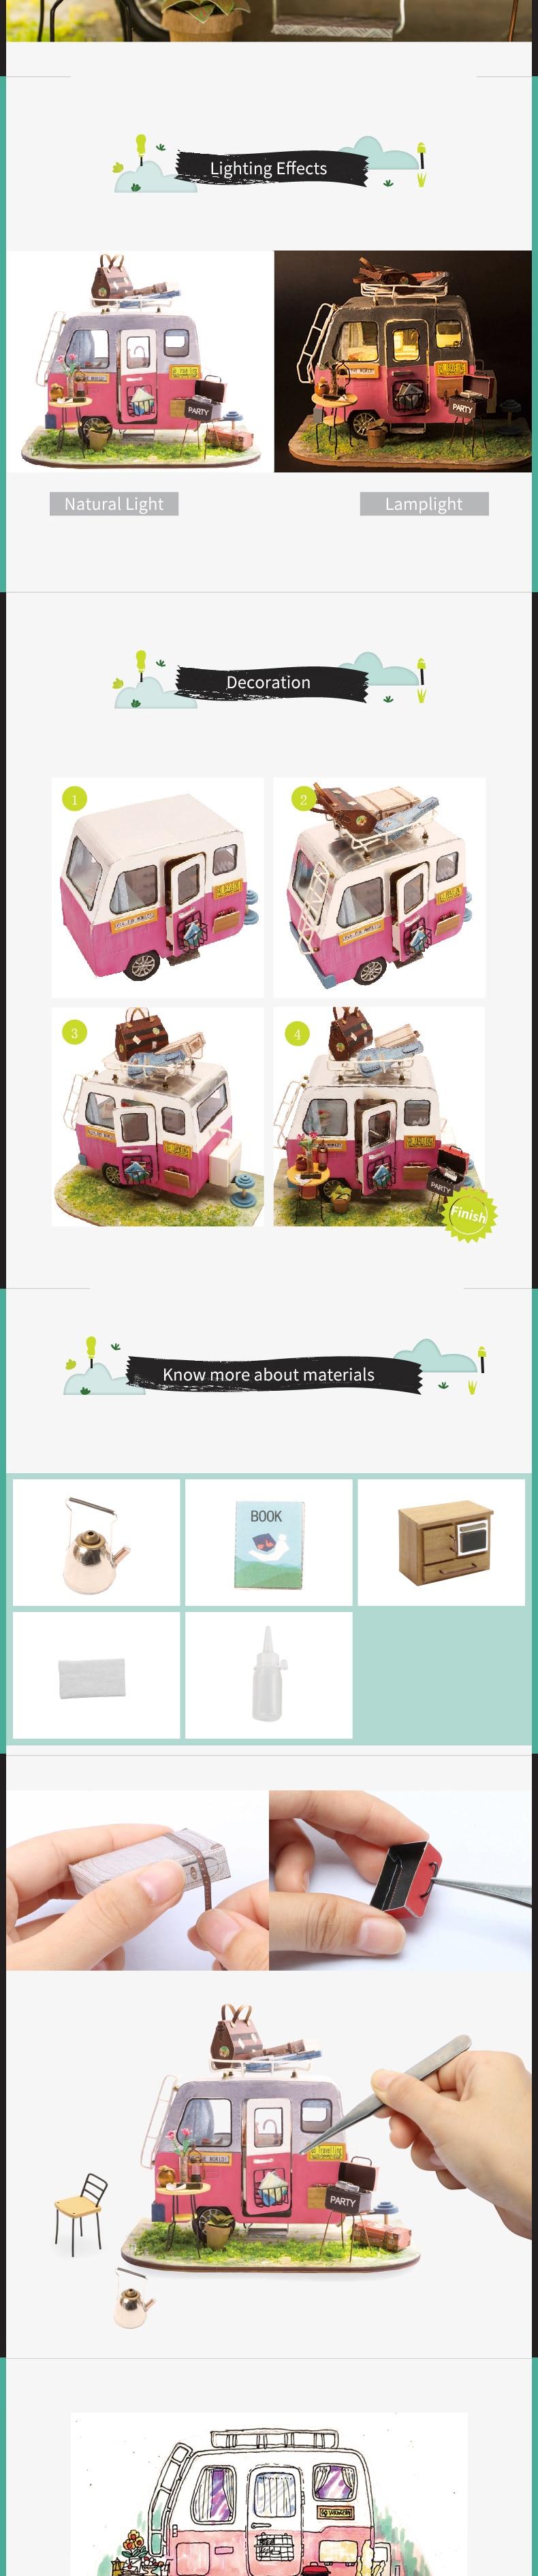 Robotime DIY Happy Children Adult Miniature Wooden Doll House